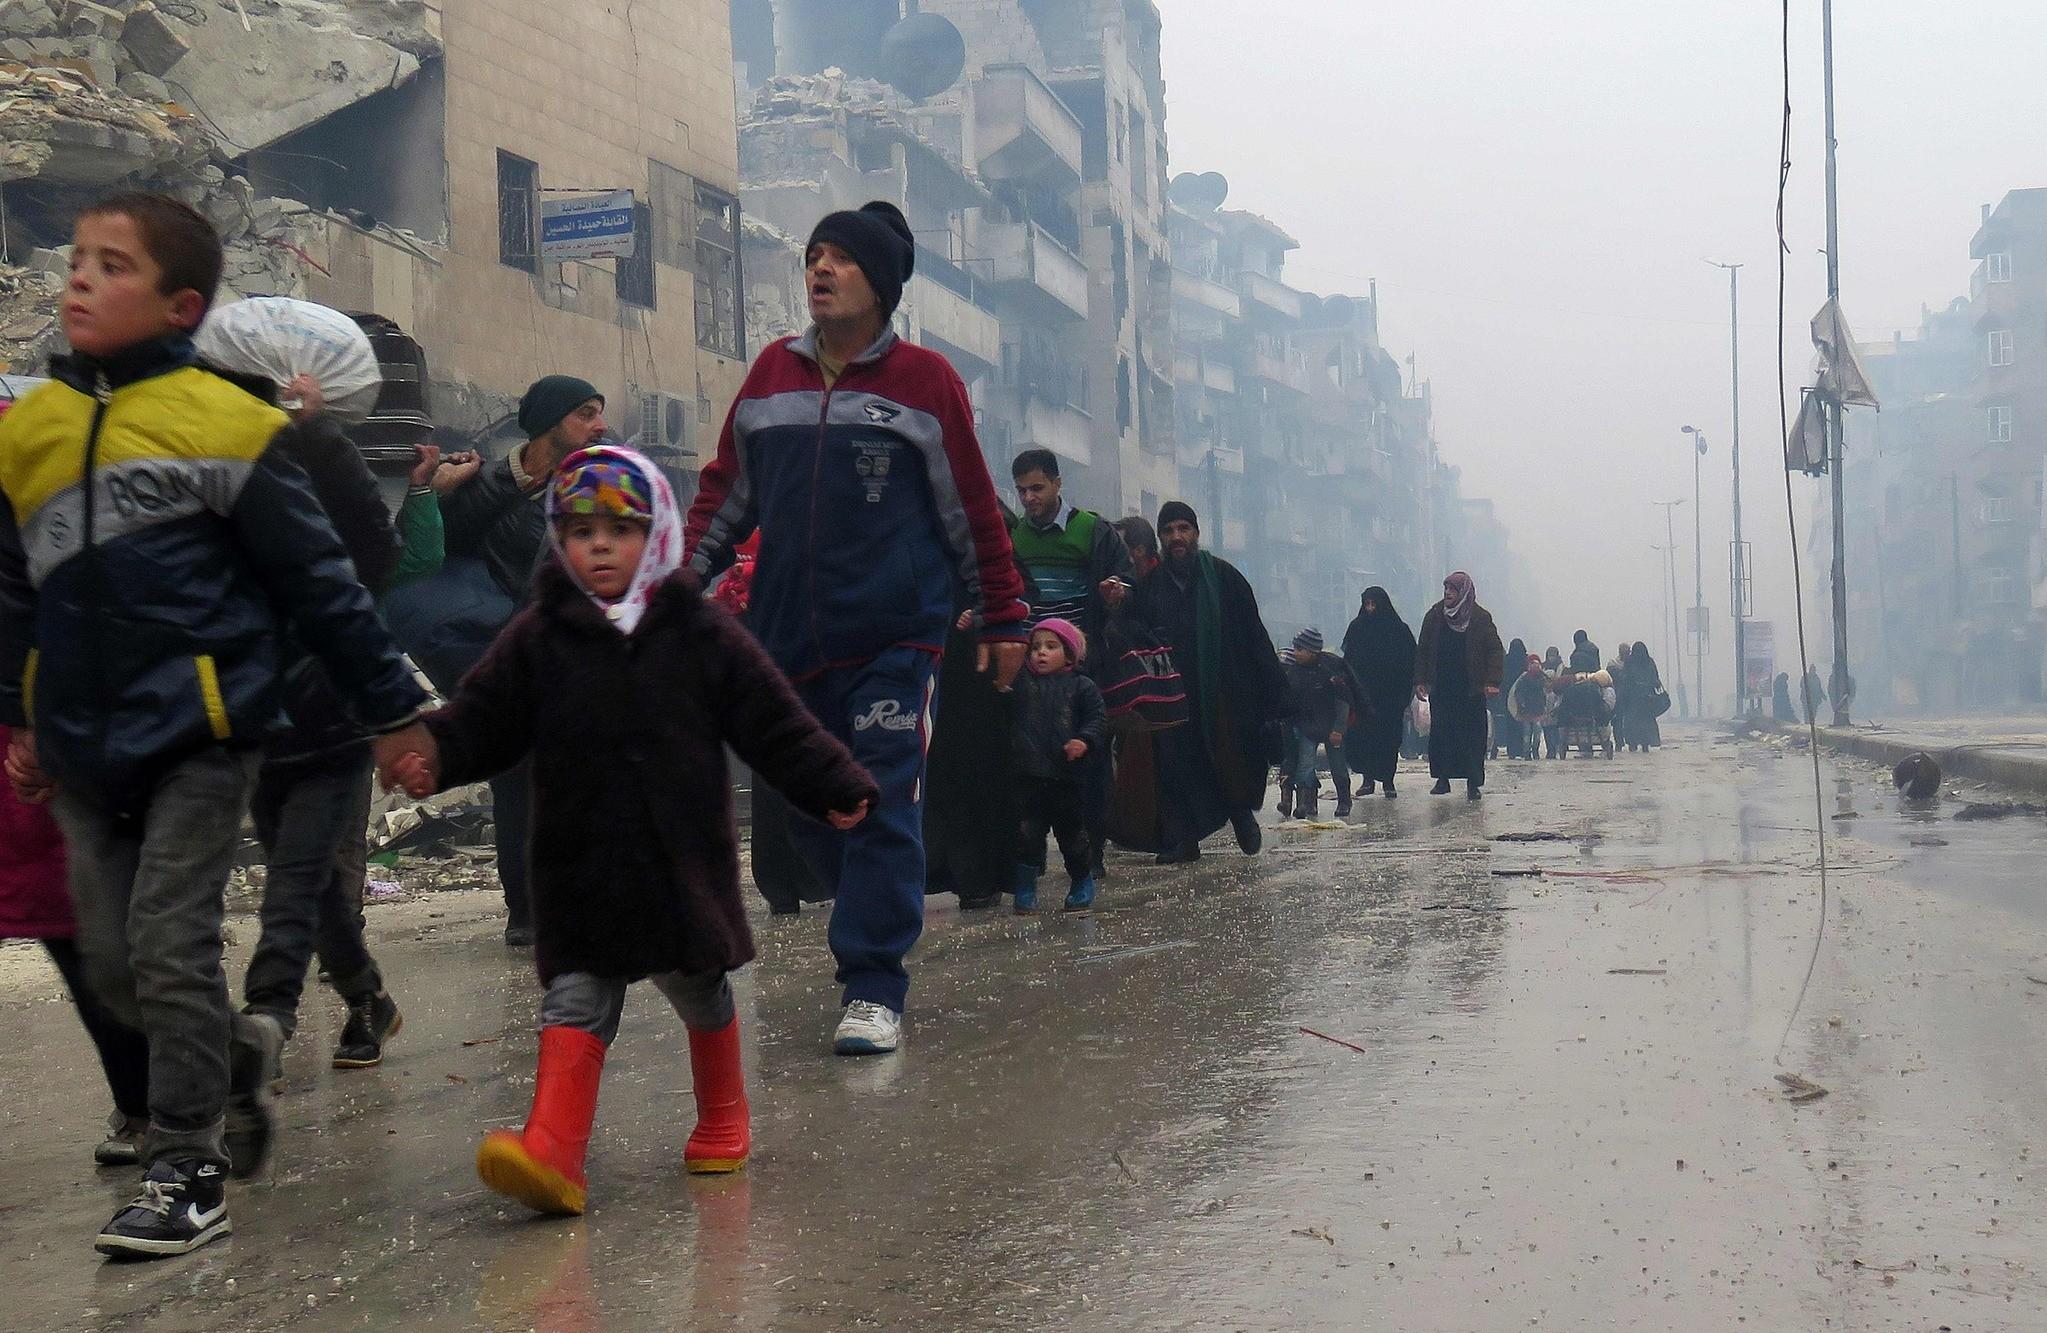 Syrian residents, fleeing violence in the restive Bustan al-Qasr neighbourhood, arrive in Aleppo's Fardos neighbourhood on Dec. 13.